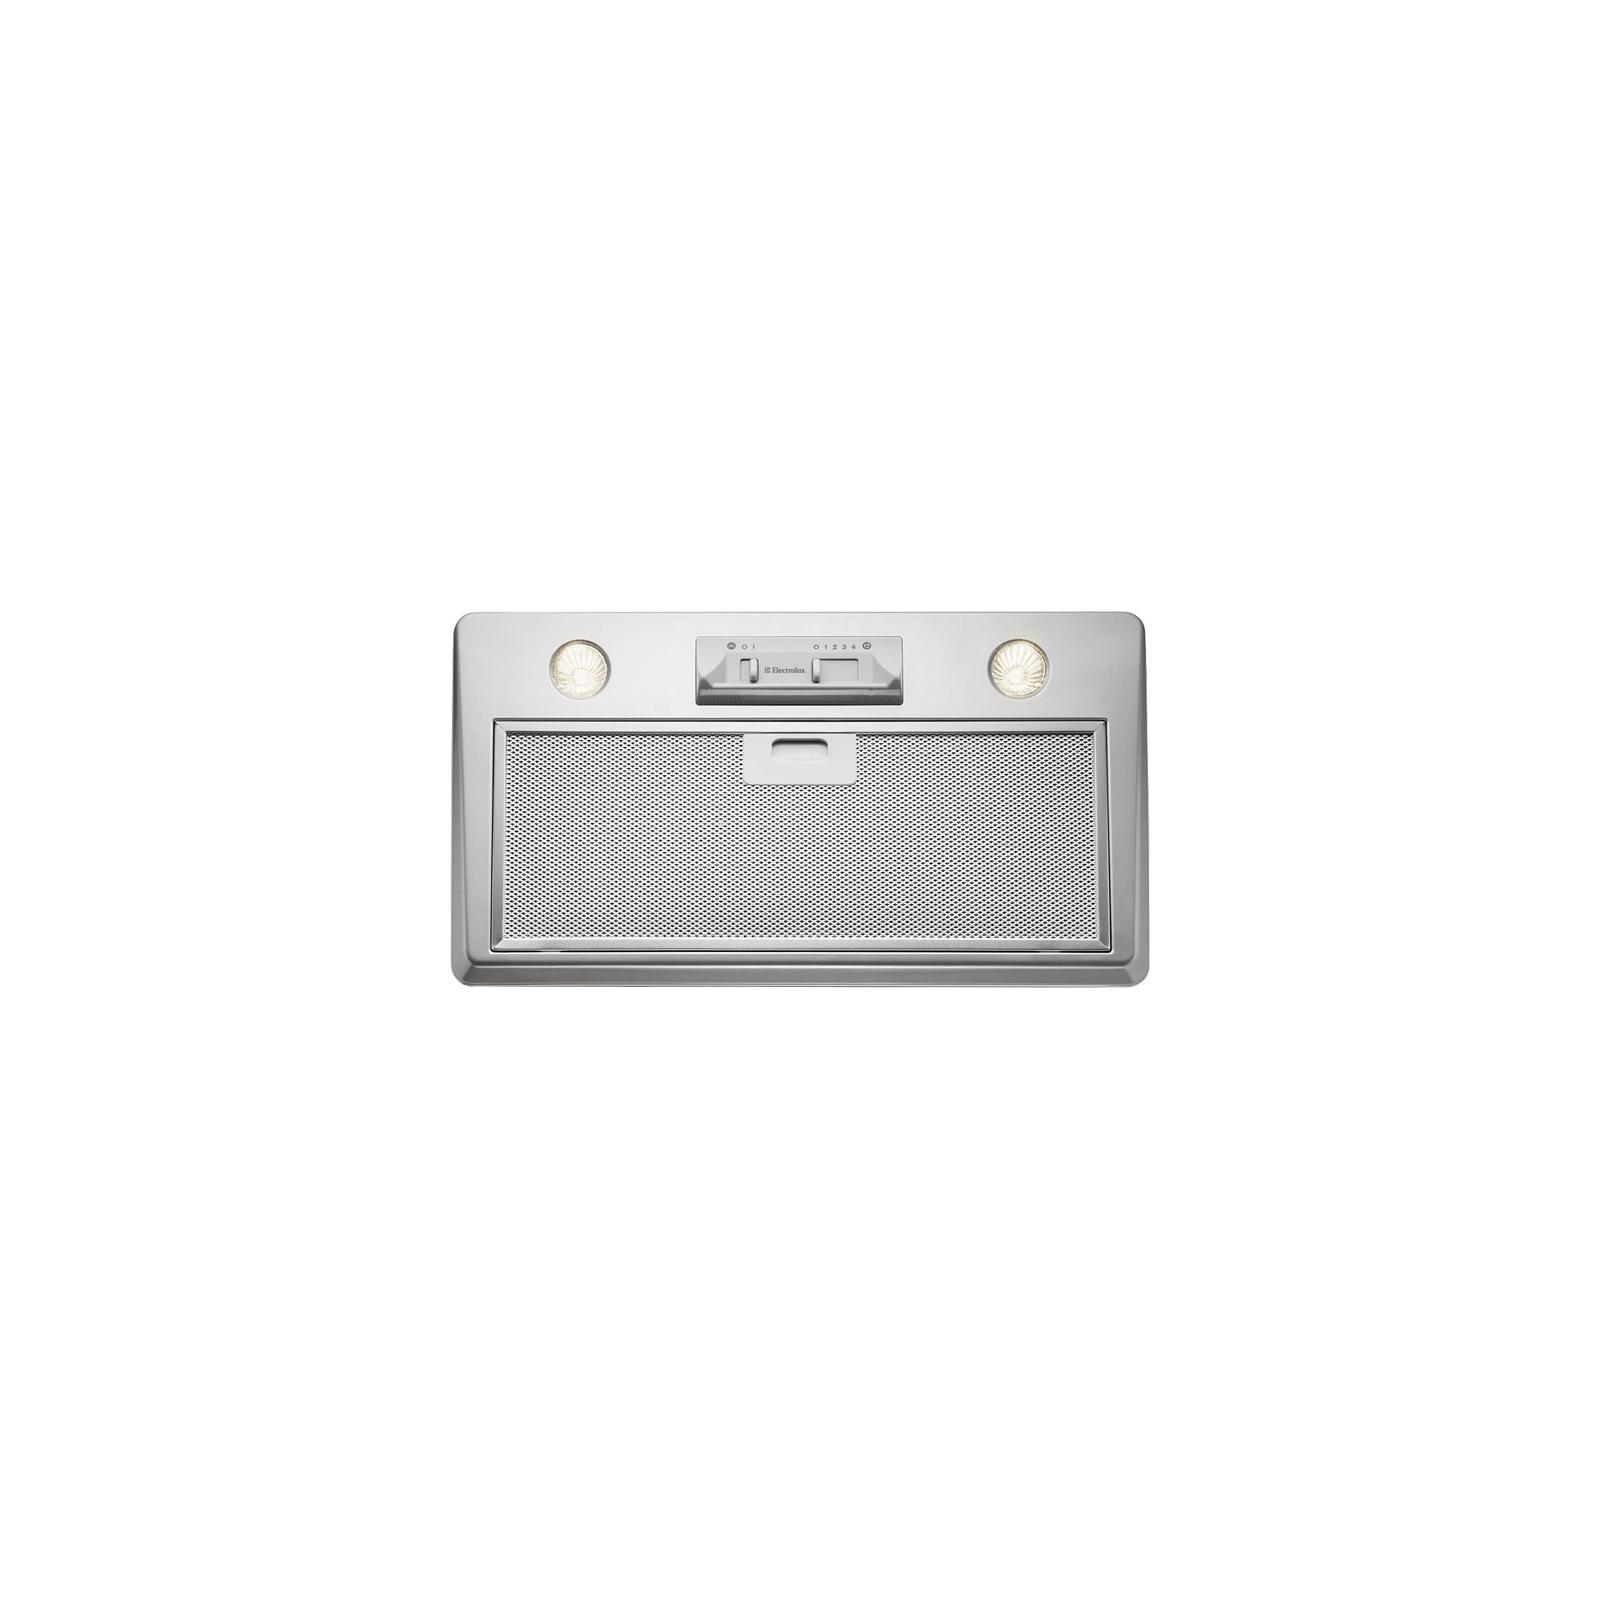 Вытяжка кухонная Electrolux EFG 50250 S (EFG50250S)